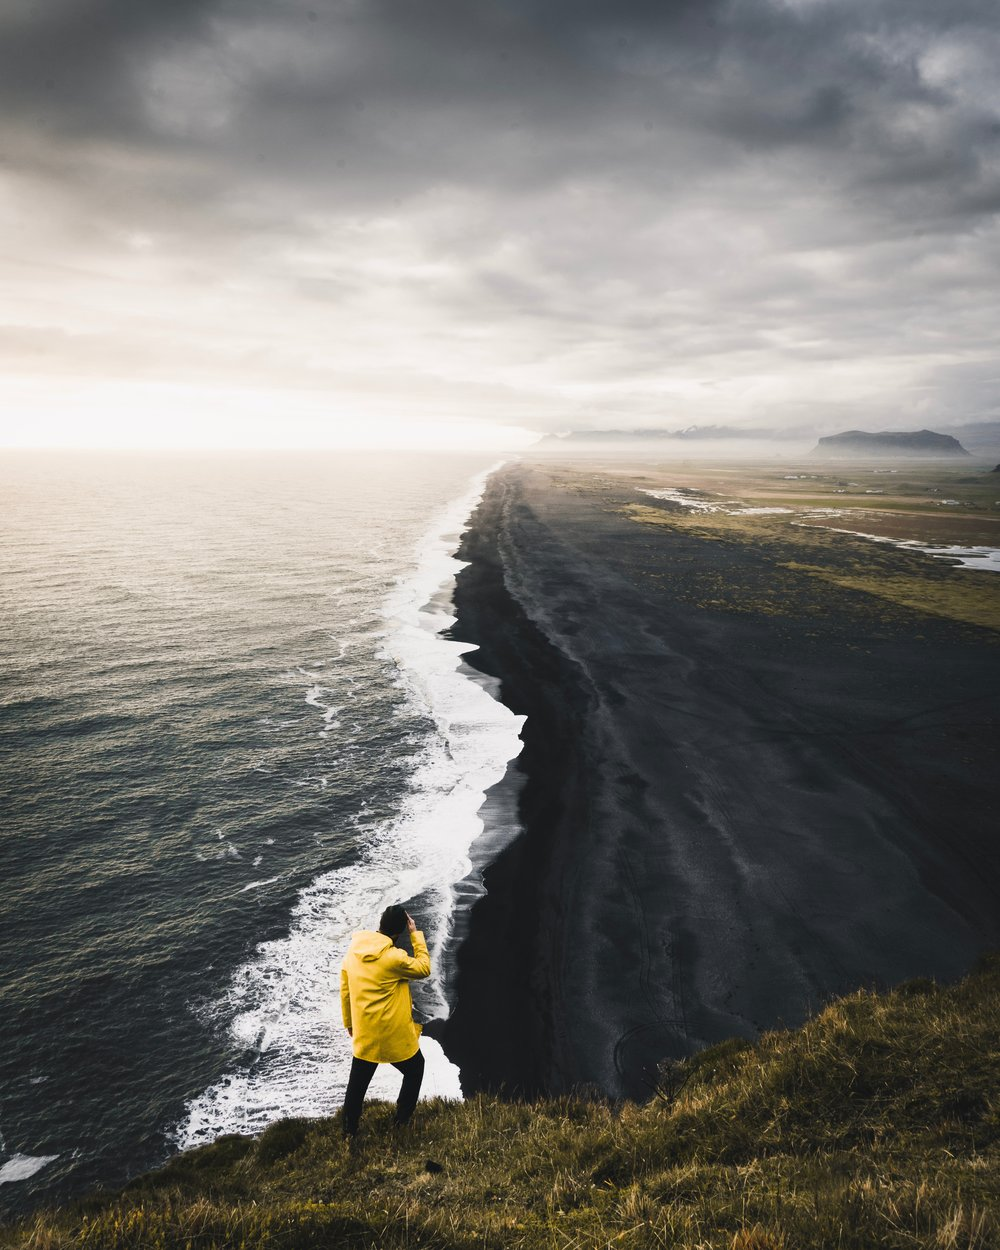 Enjoy Iceland's Southern Coast - wherever it takes you.